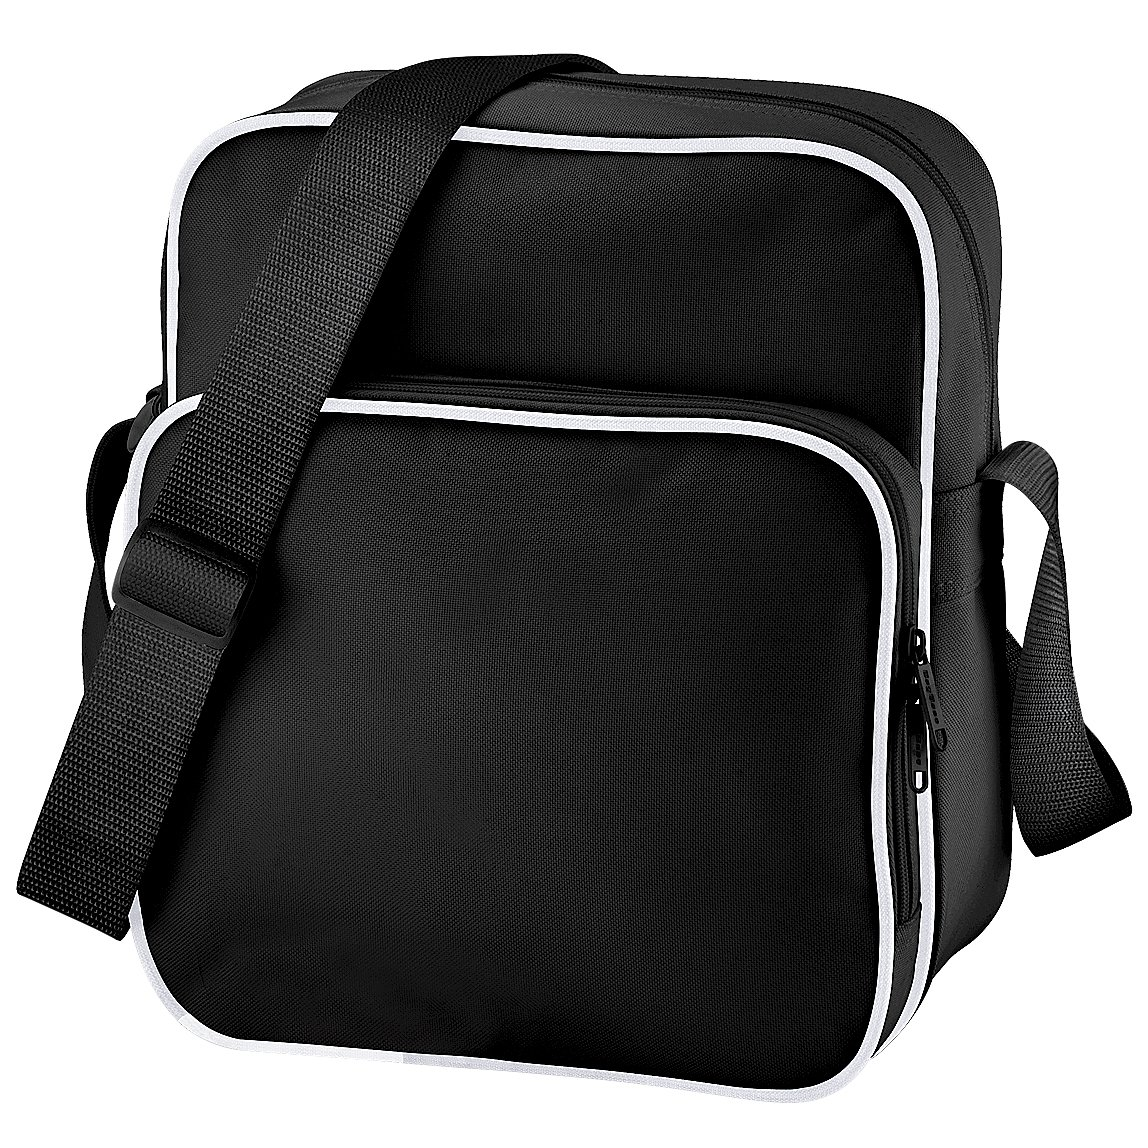 Bagbase Adjustable Retro Day Bag 10 Liters